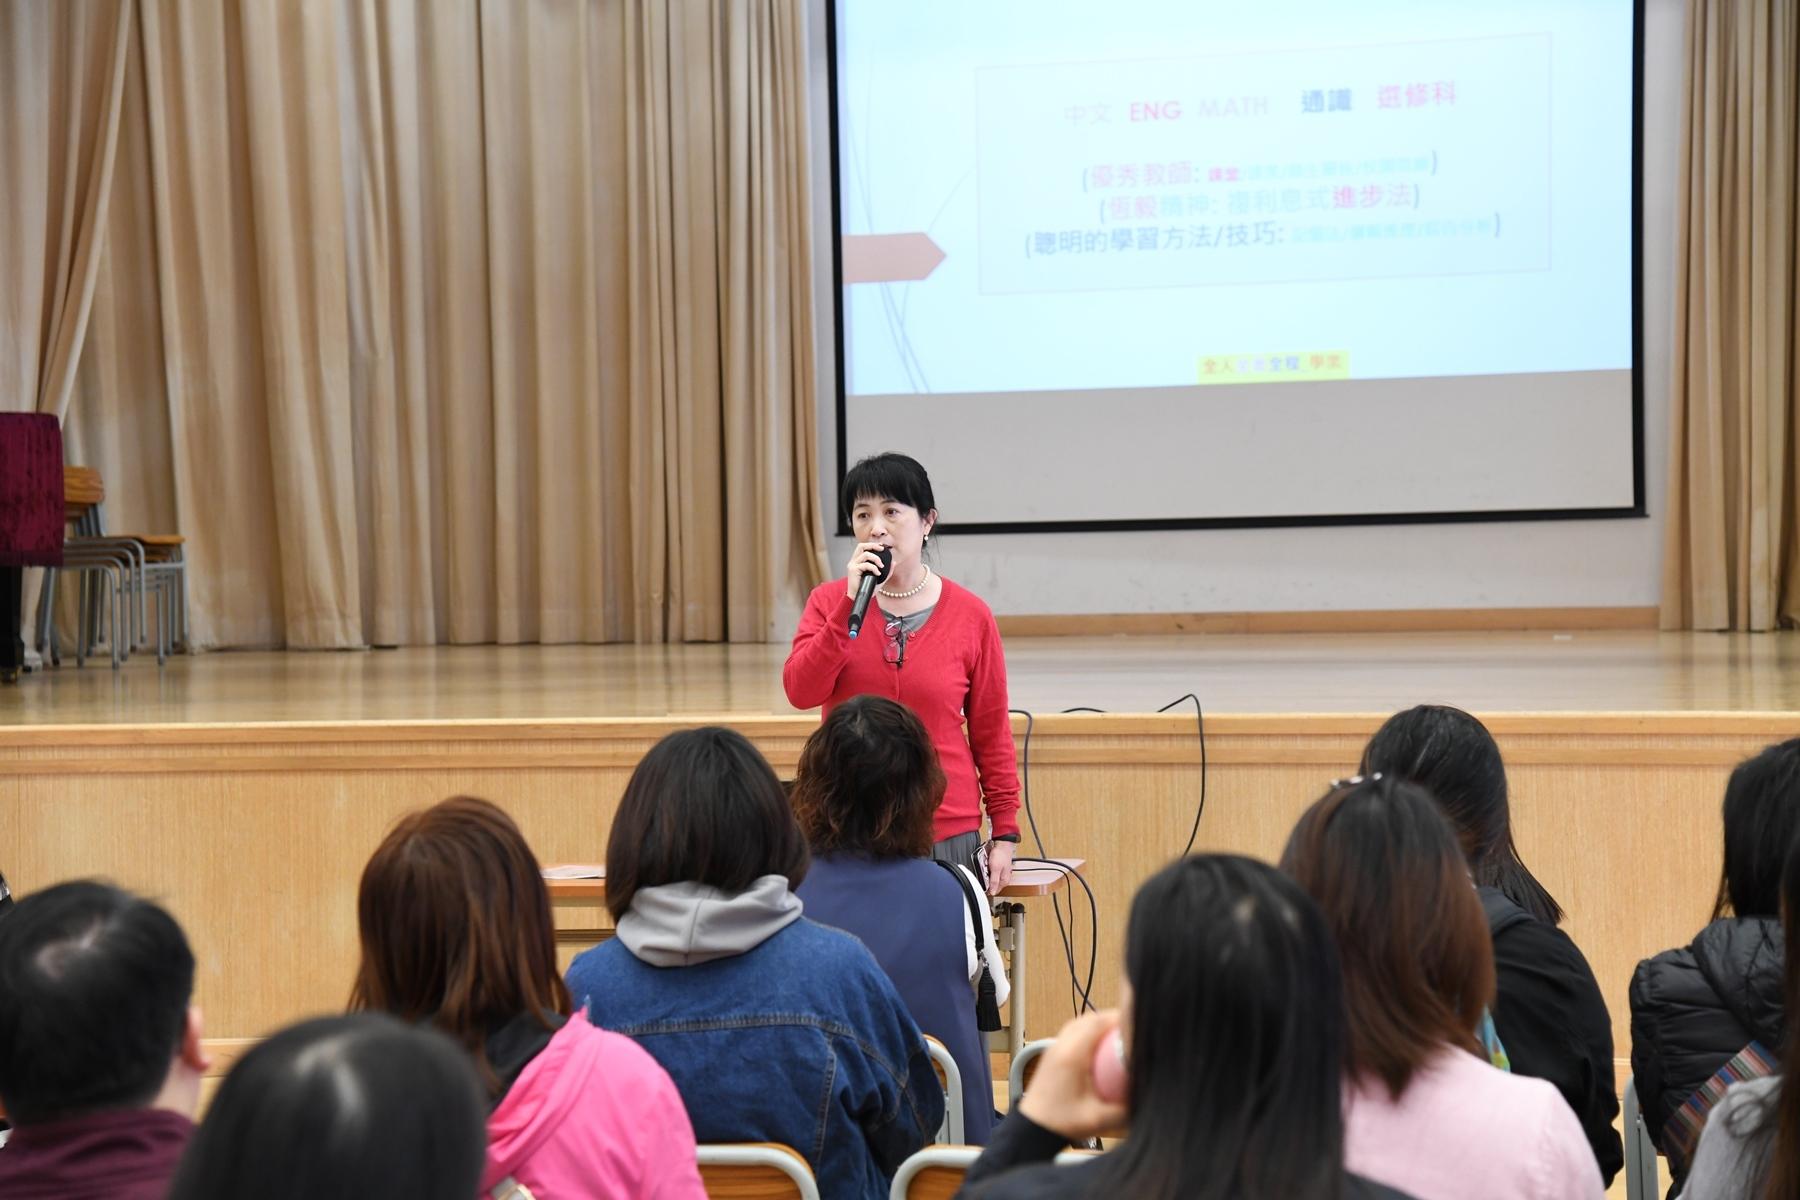 http://npc.edu.hk/sites/default/files/dsc_0177.jpg